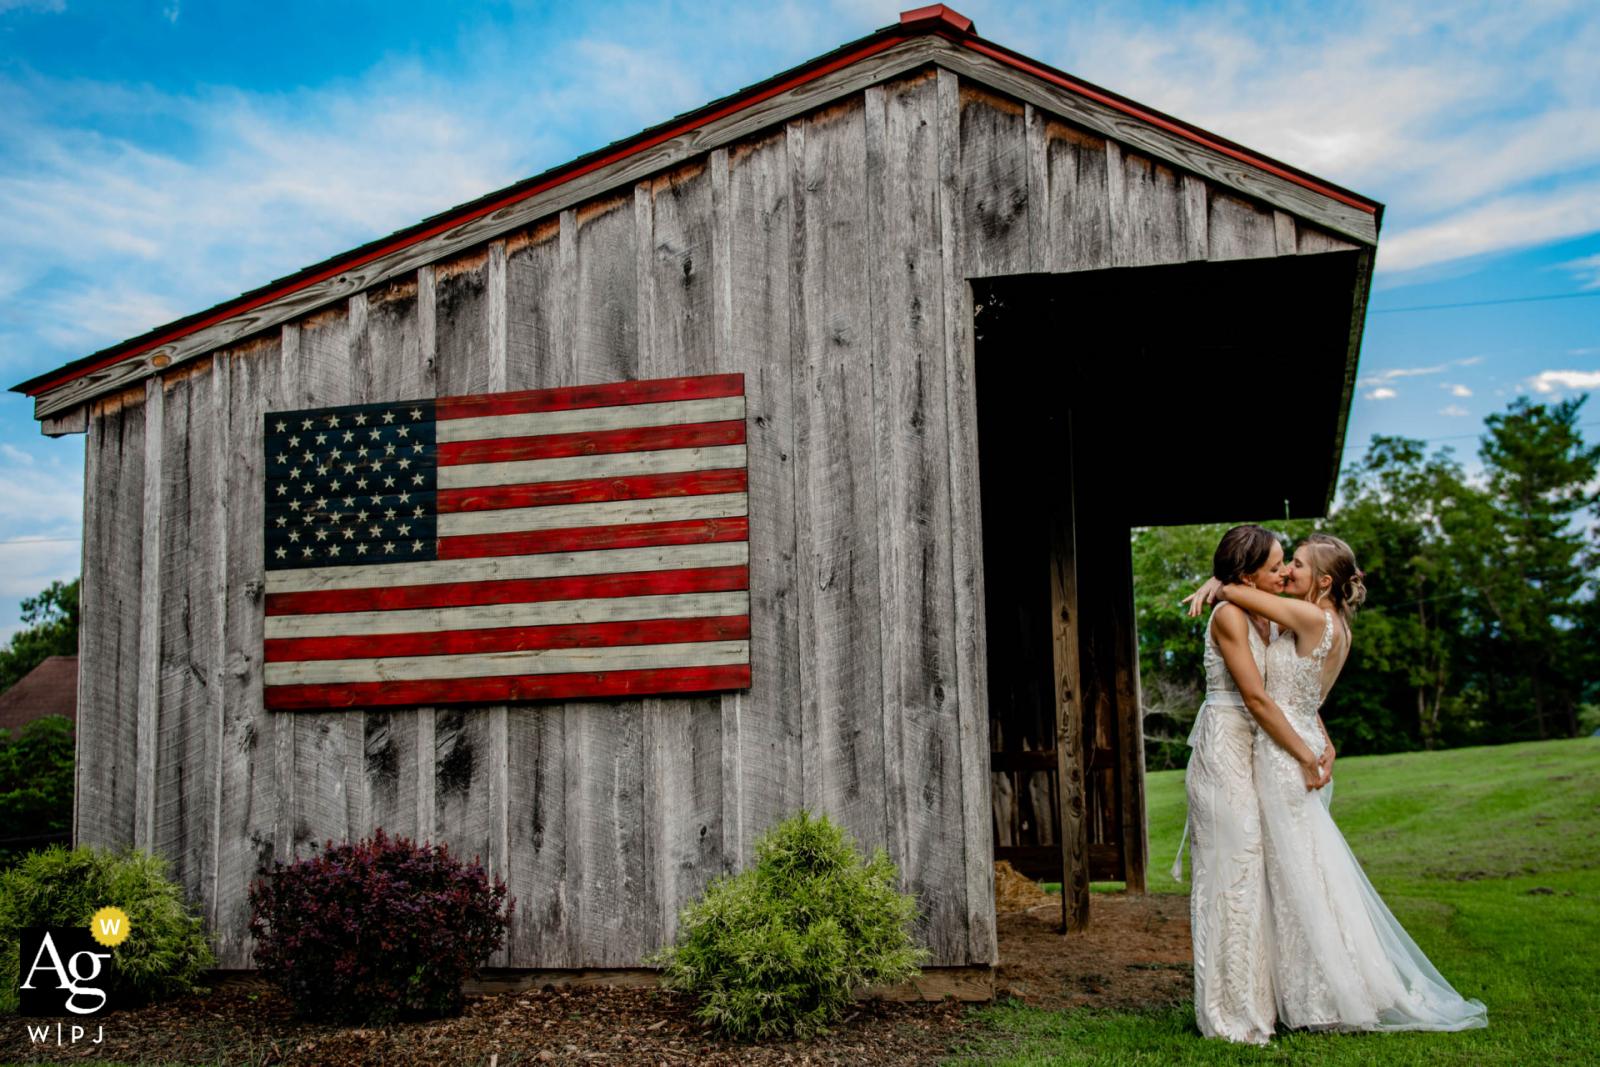 Artistic wedding photo from a Virginia Backyard Wedding